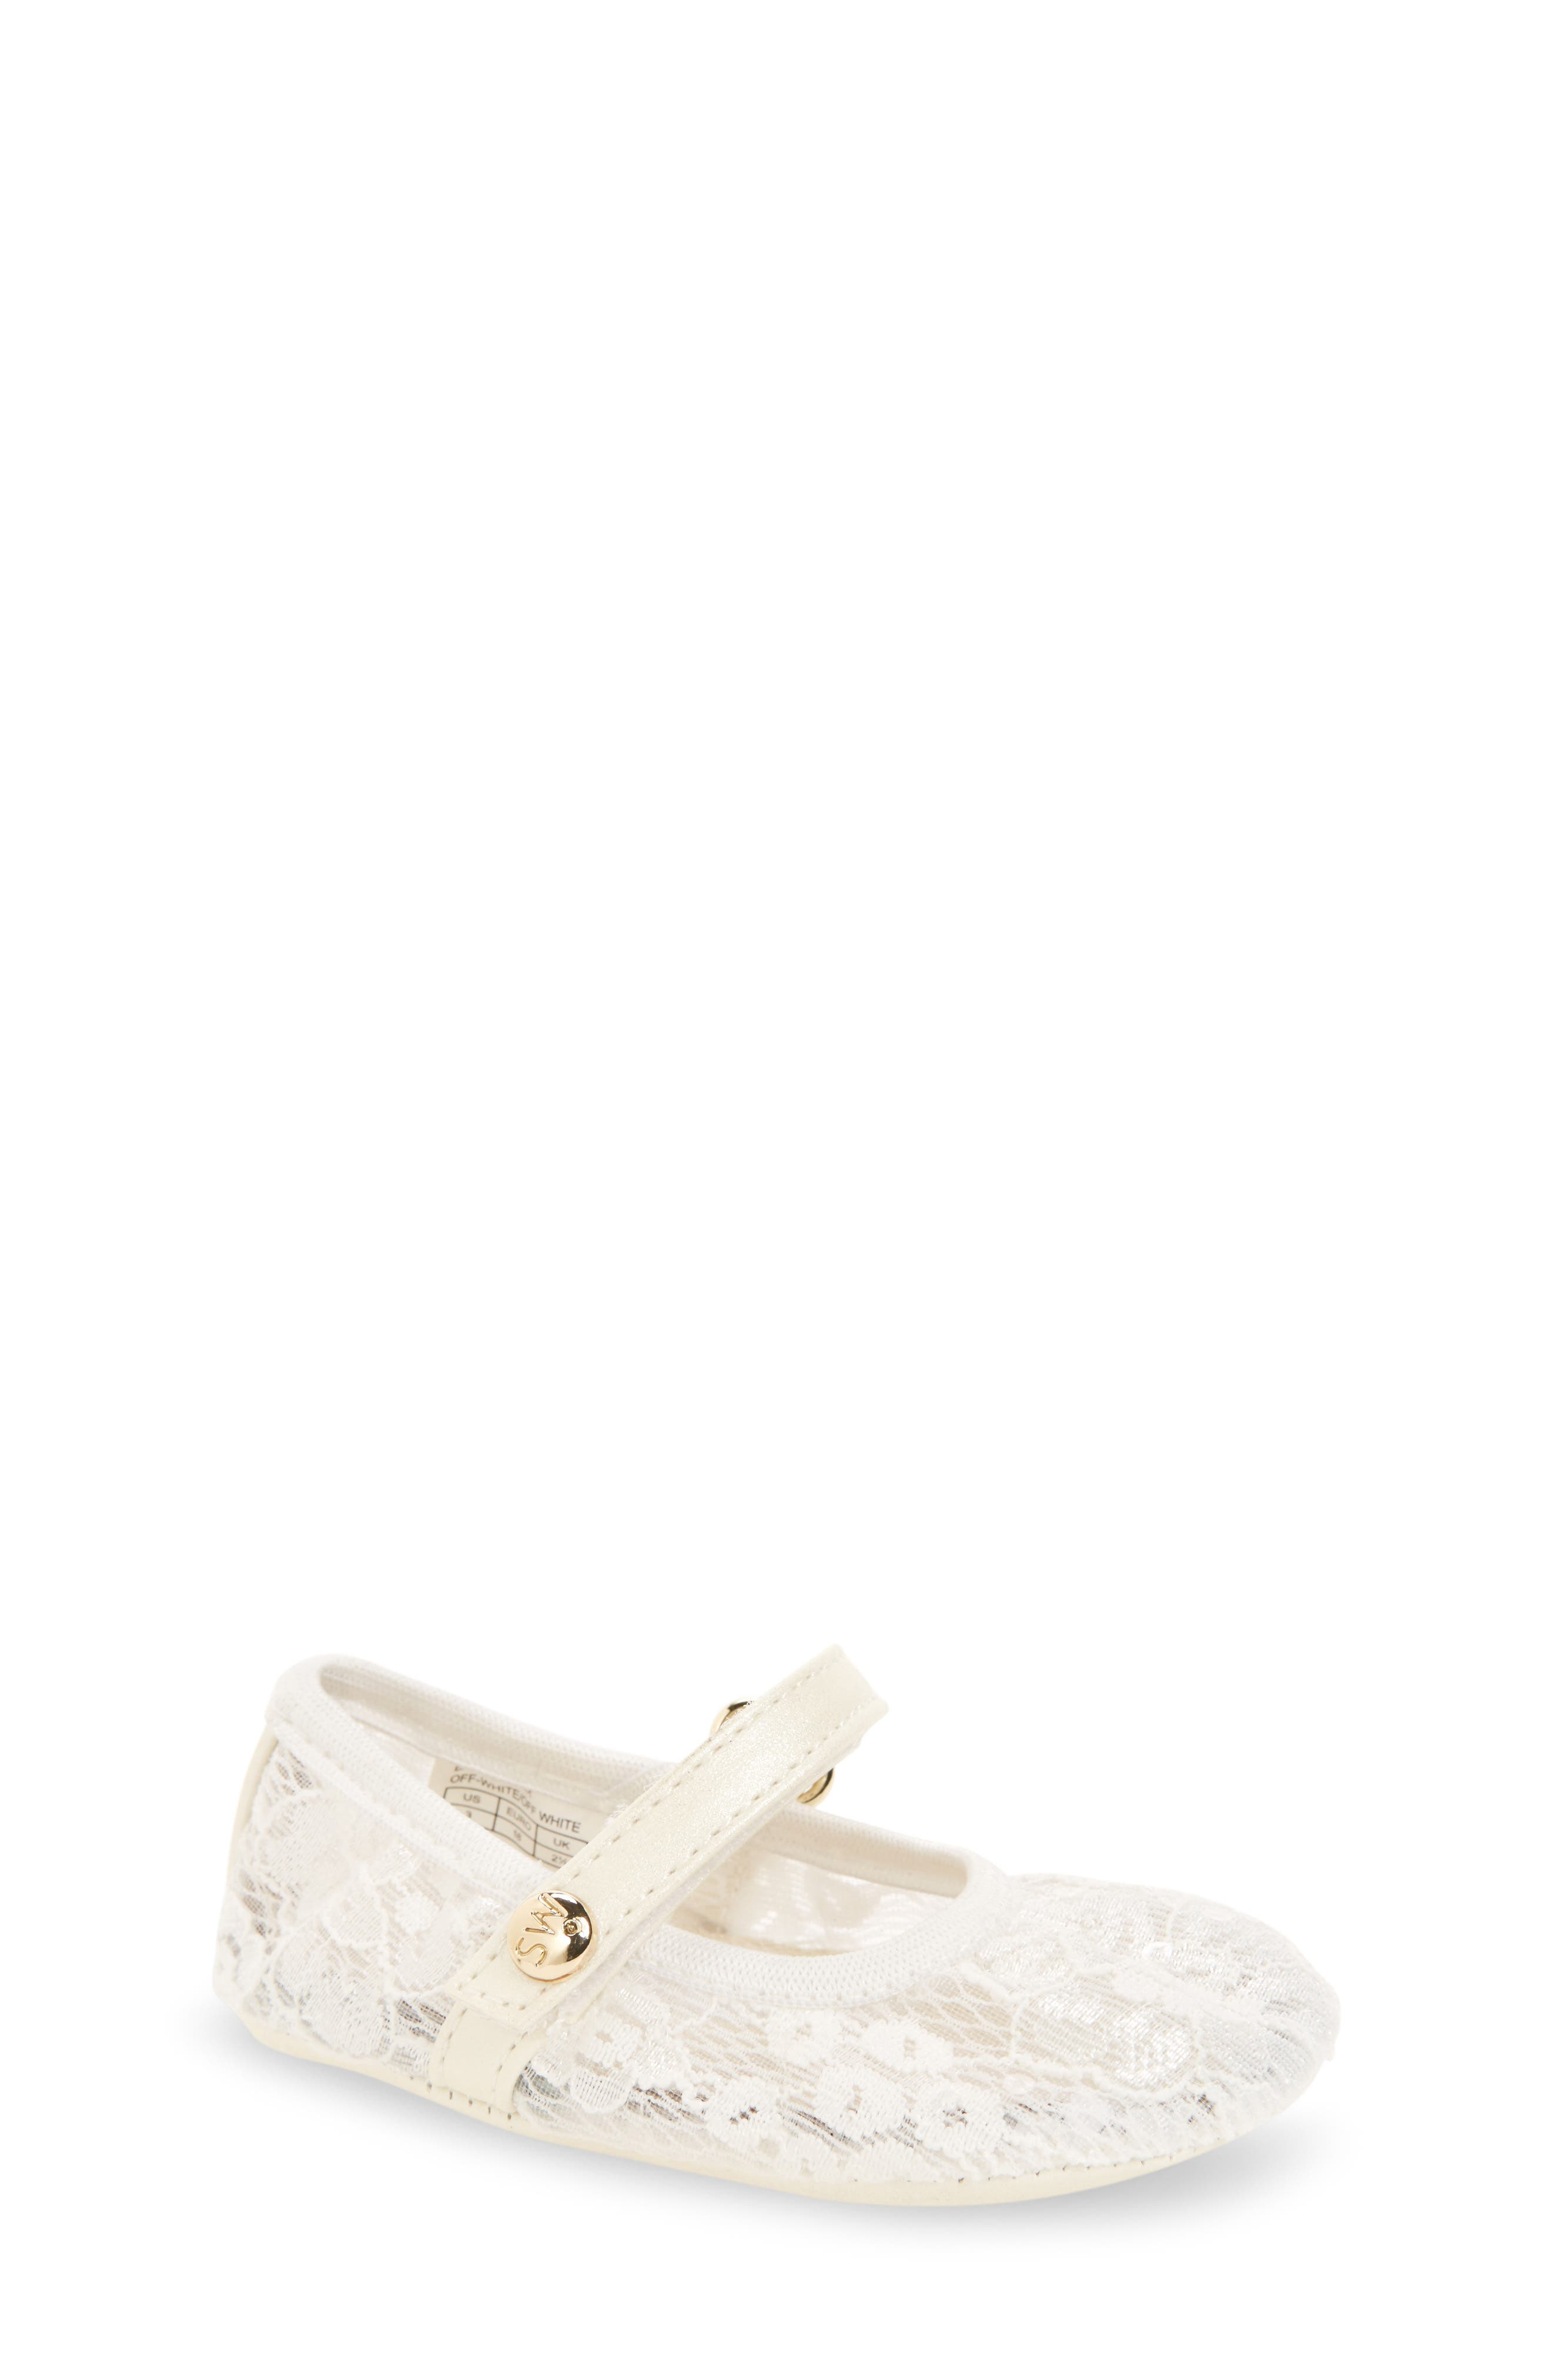 Baby Dancer Crib Shoe,                         Main,                         color, 100